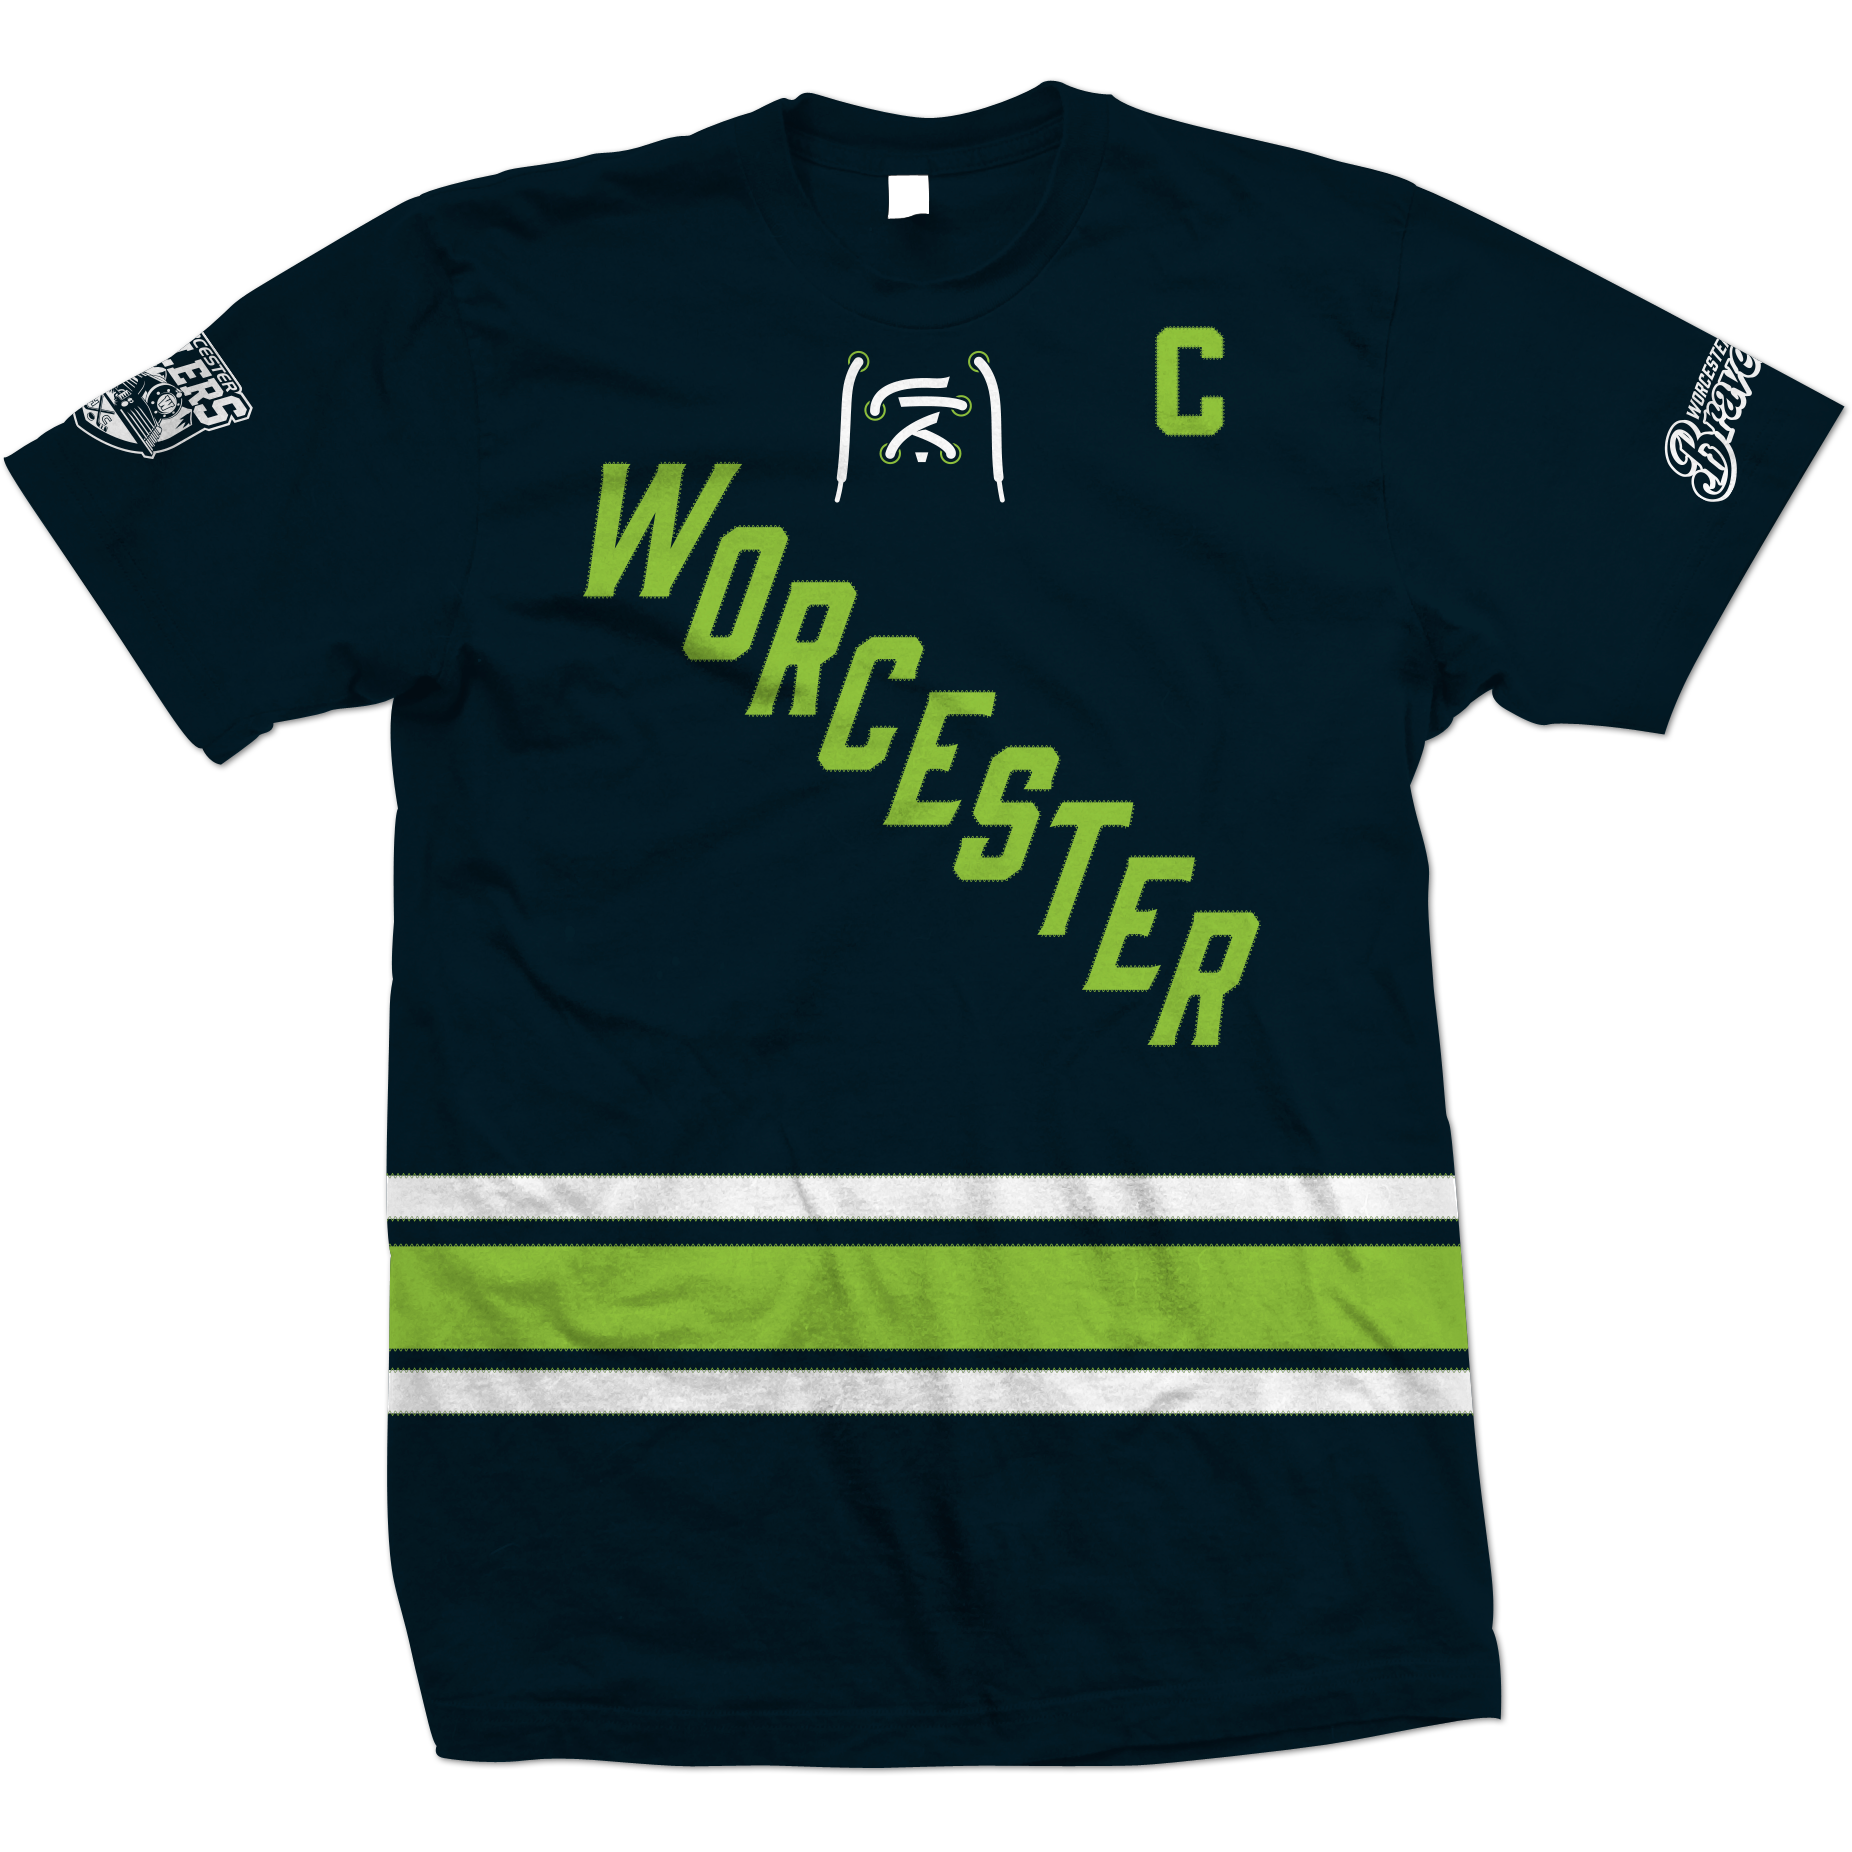 WB_Shirt_Hockey_Night_01.png